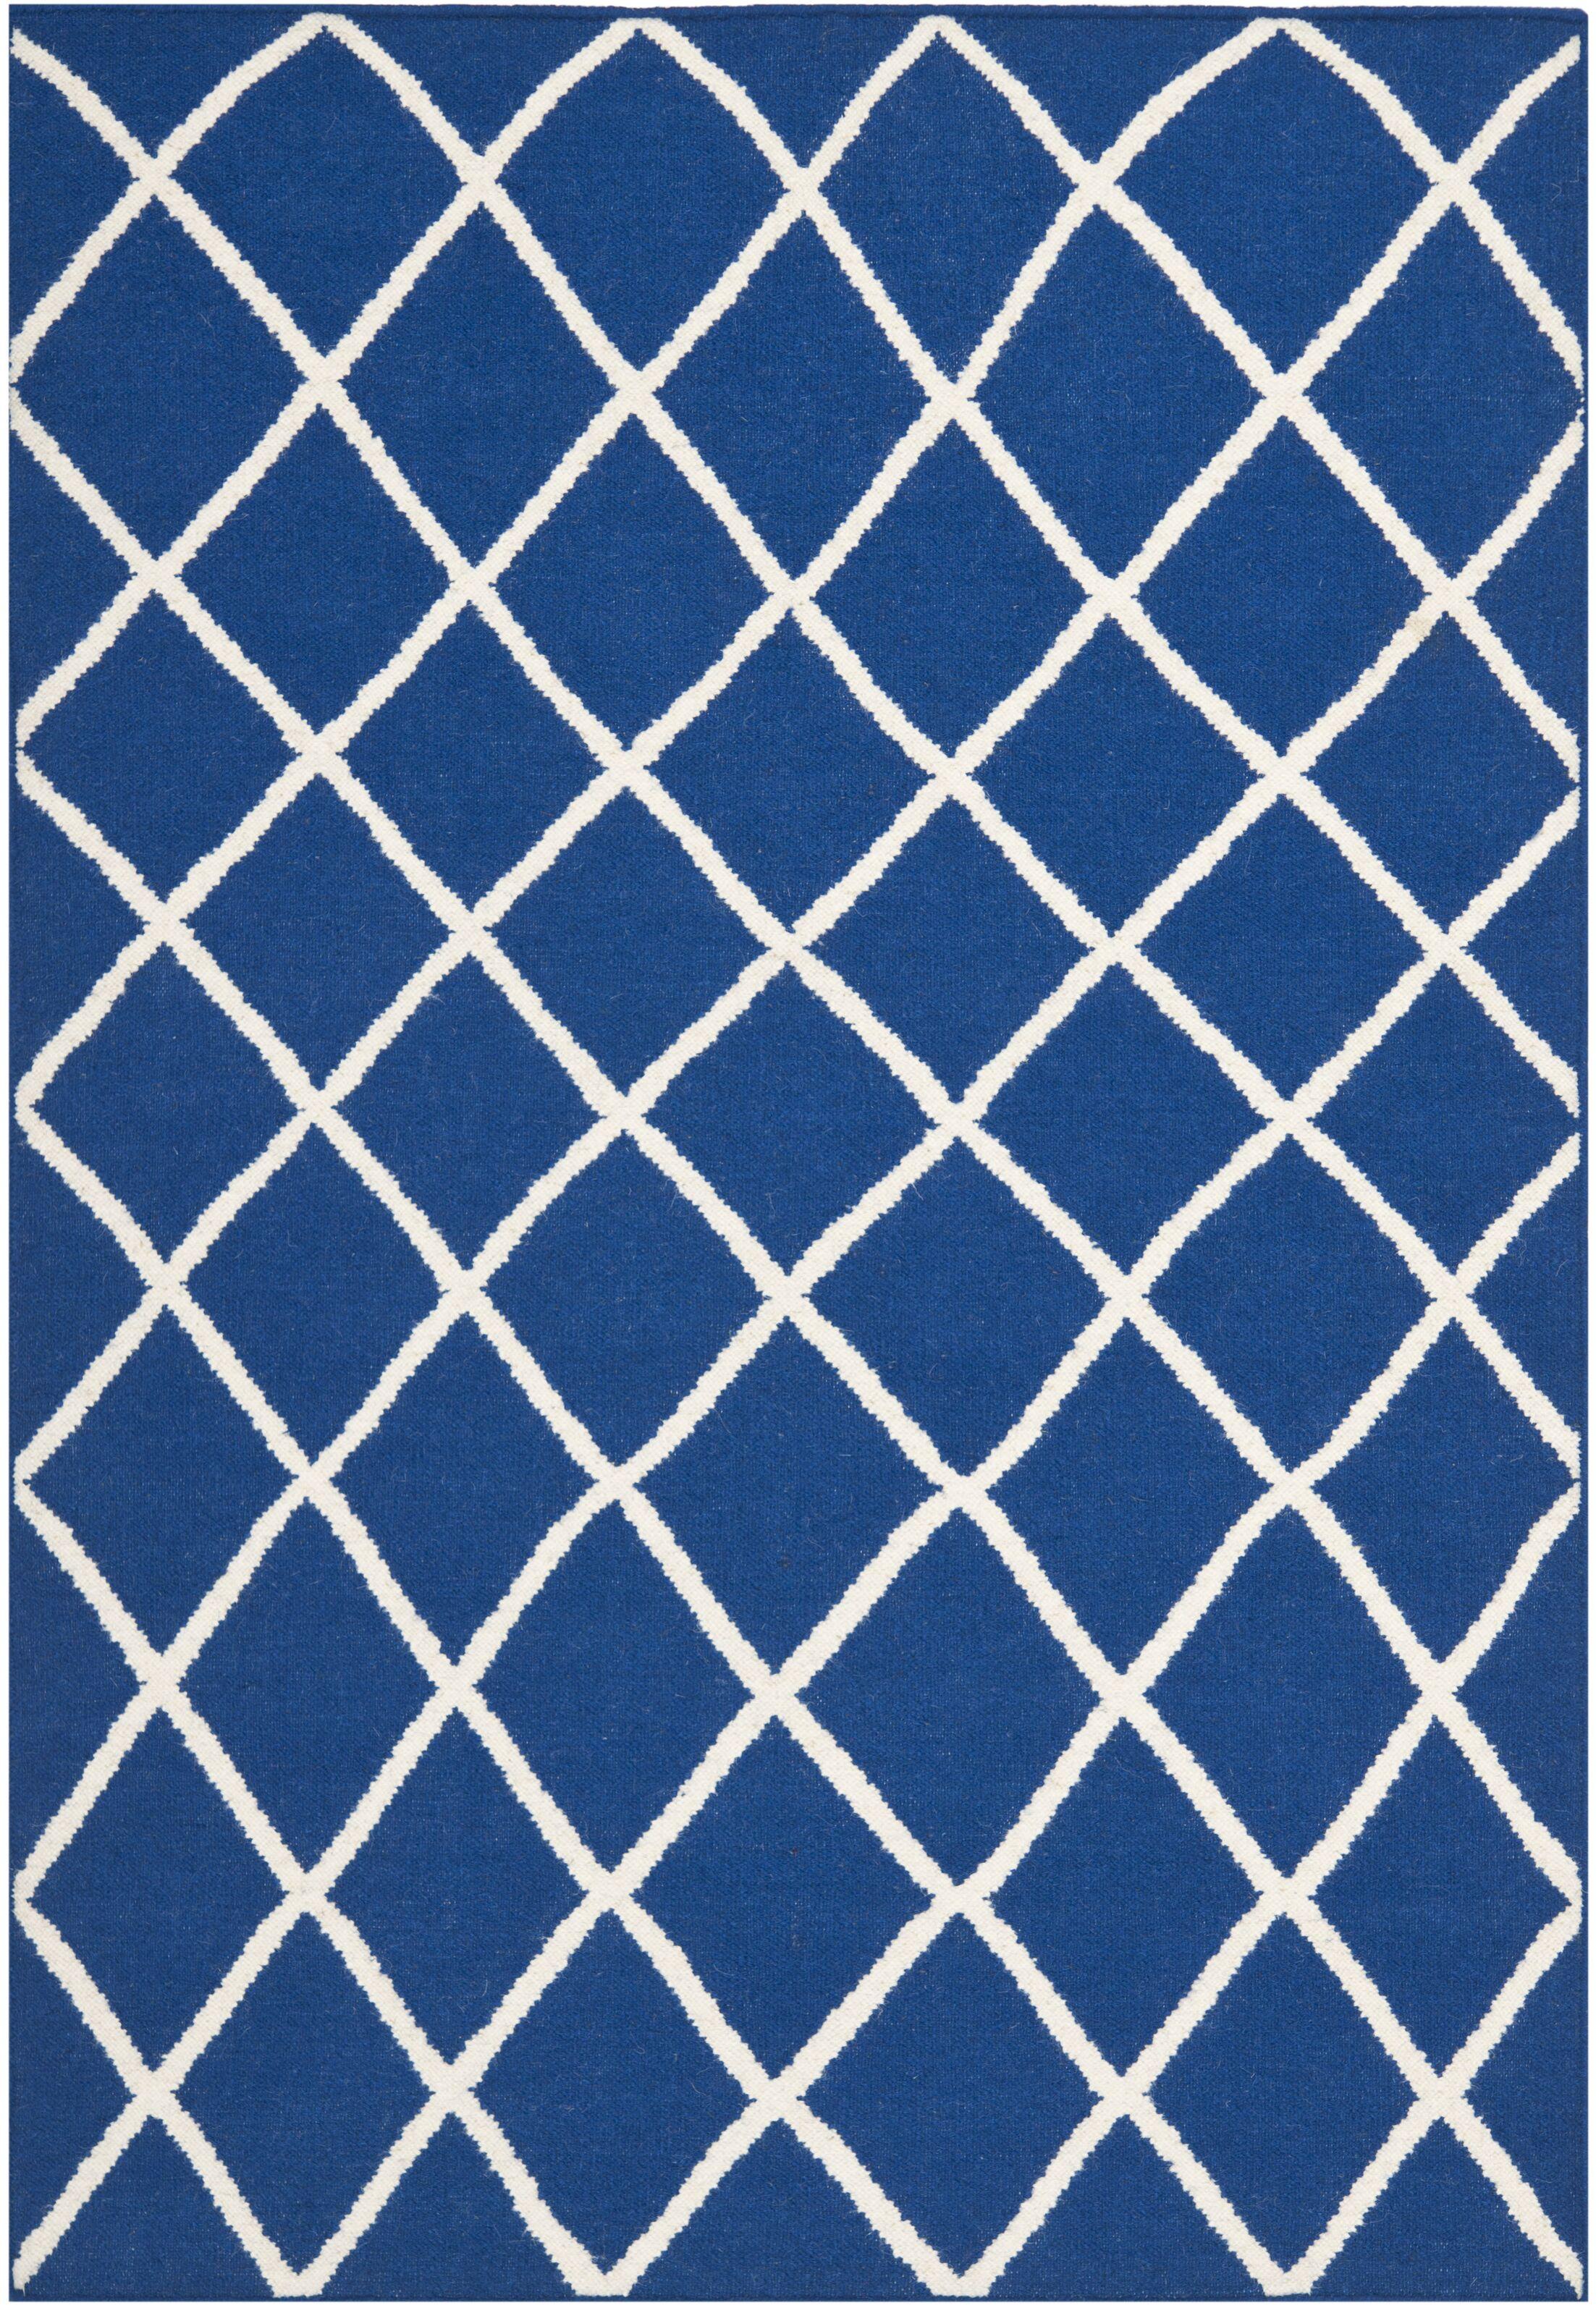 Blaisdell Hand-Woven Dark Blue Area Rug Rug Size: Rectangle 9' x 12'